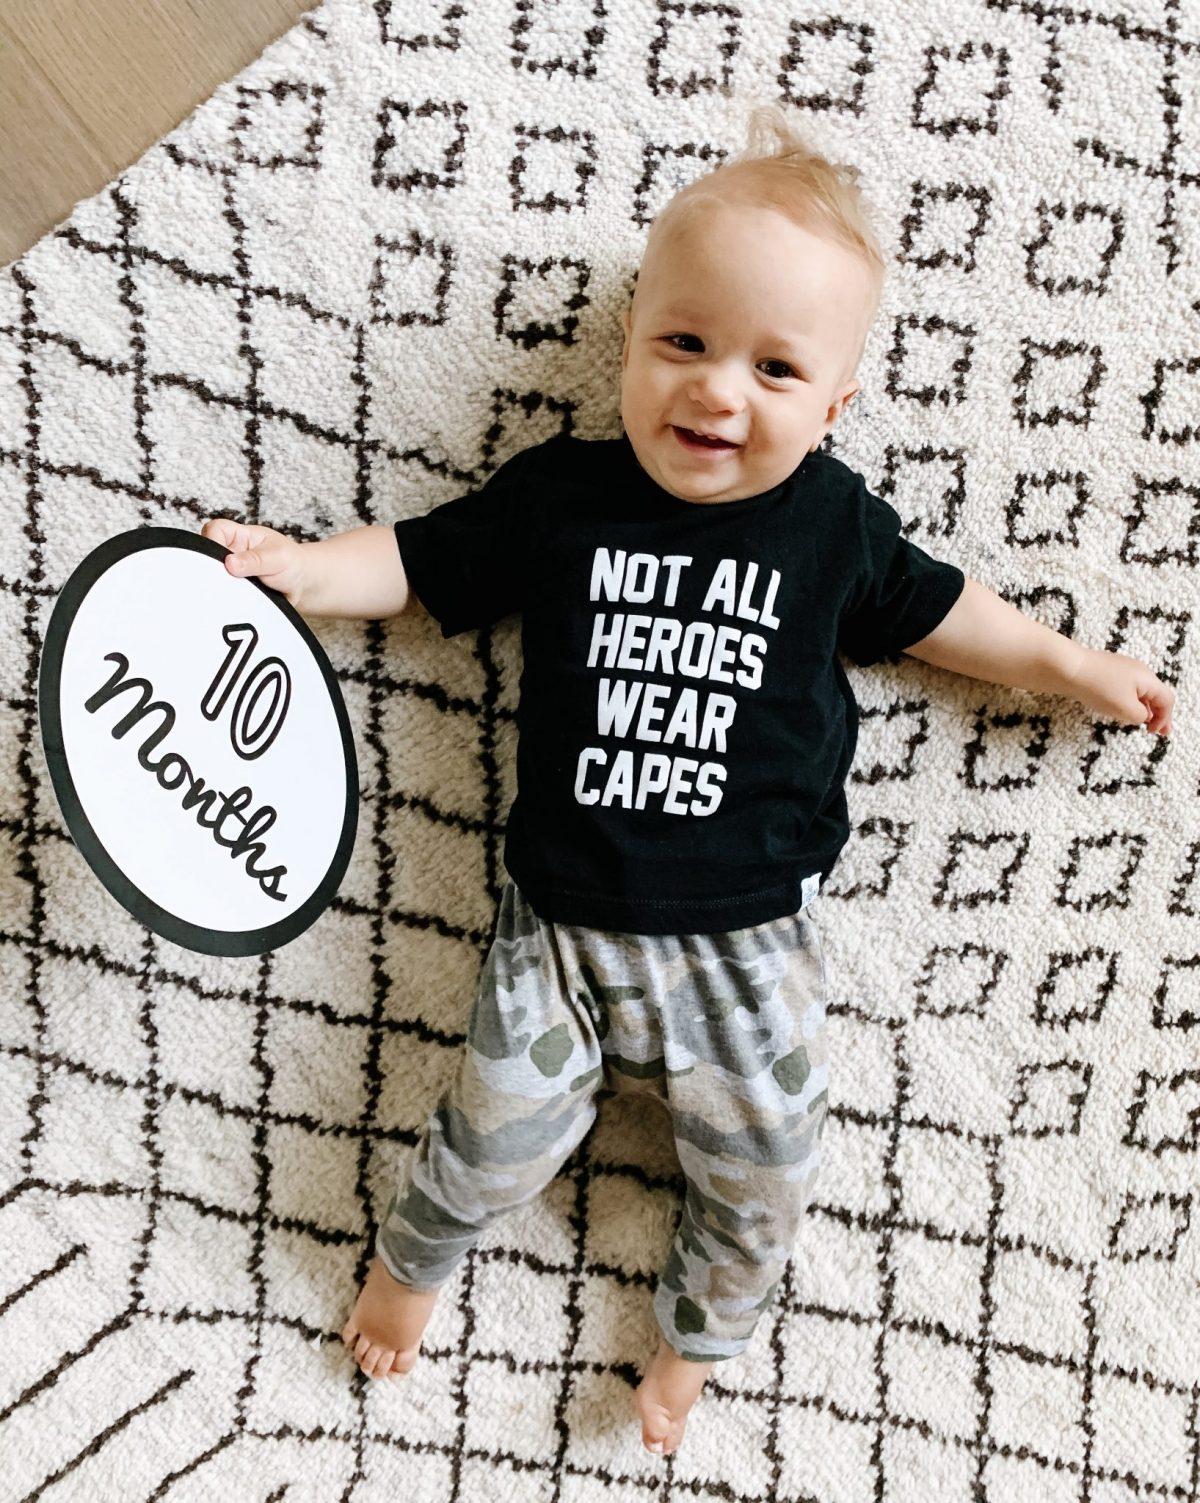 Baby Gray   10 Month Update